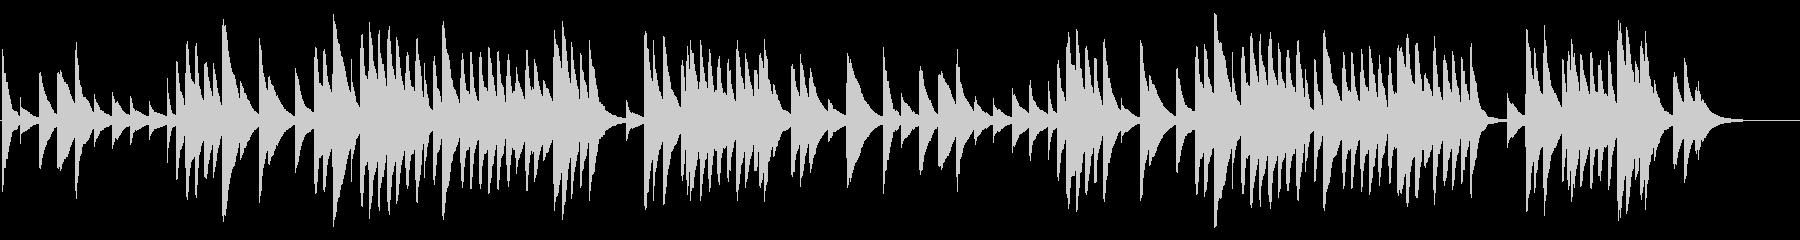 G線上のアリア 18弁オルゴールの未再生の波形